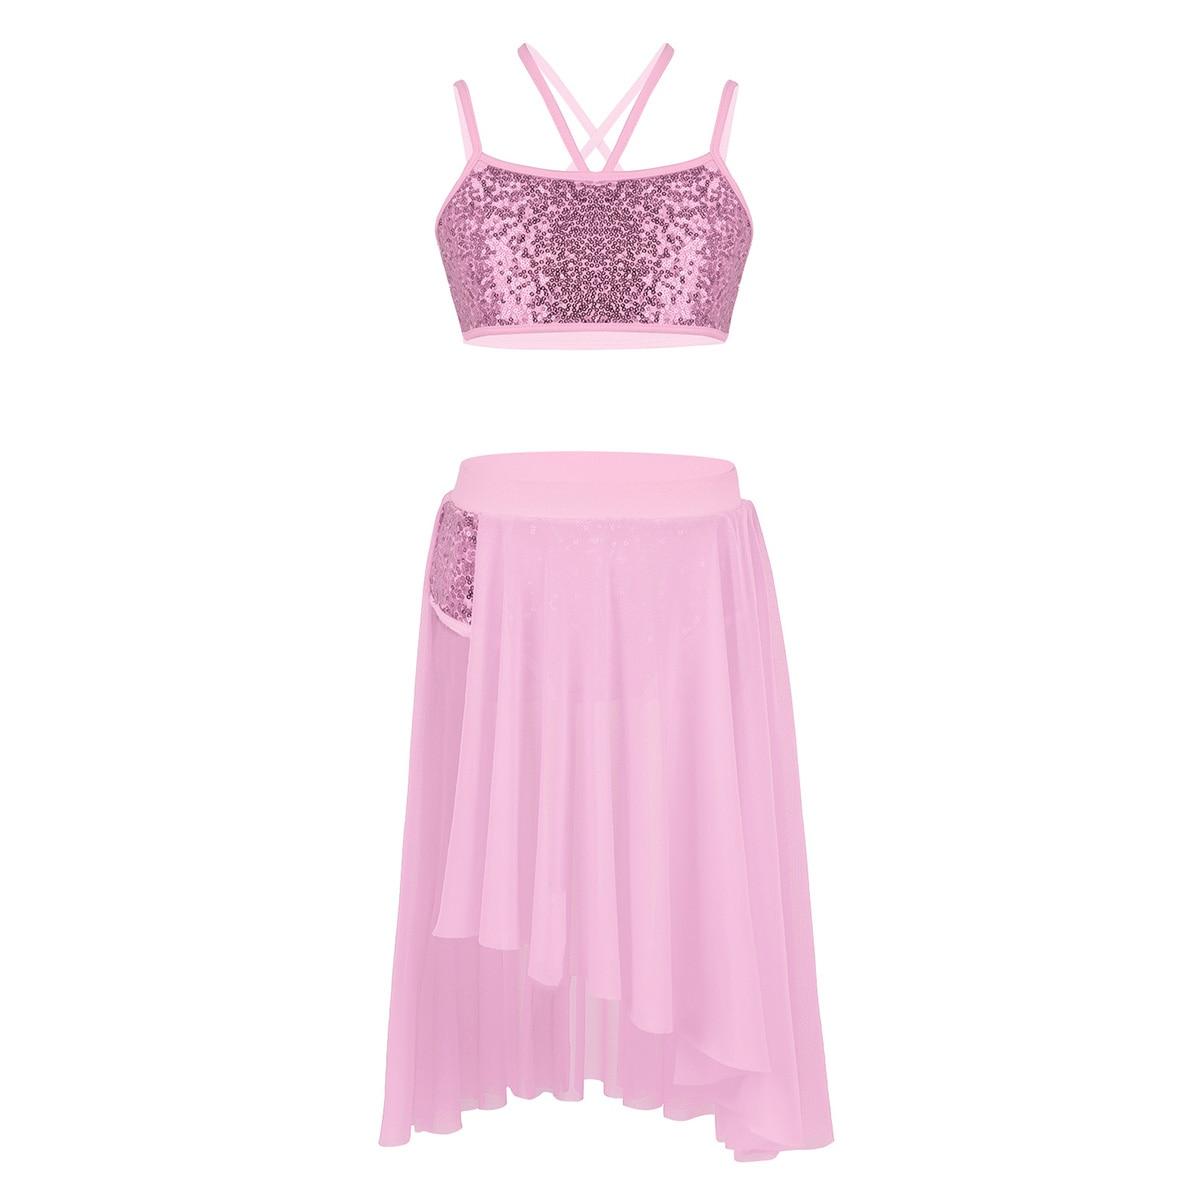 794341429 2Pcs Kids Teen Lyrical Dance Dress Ballet Shiny Crop Top and Shorts ...